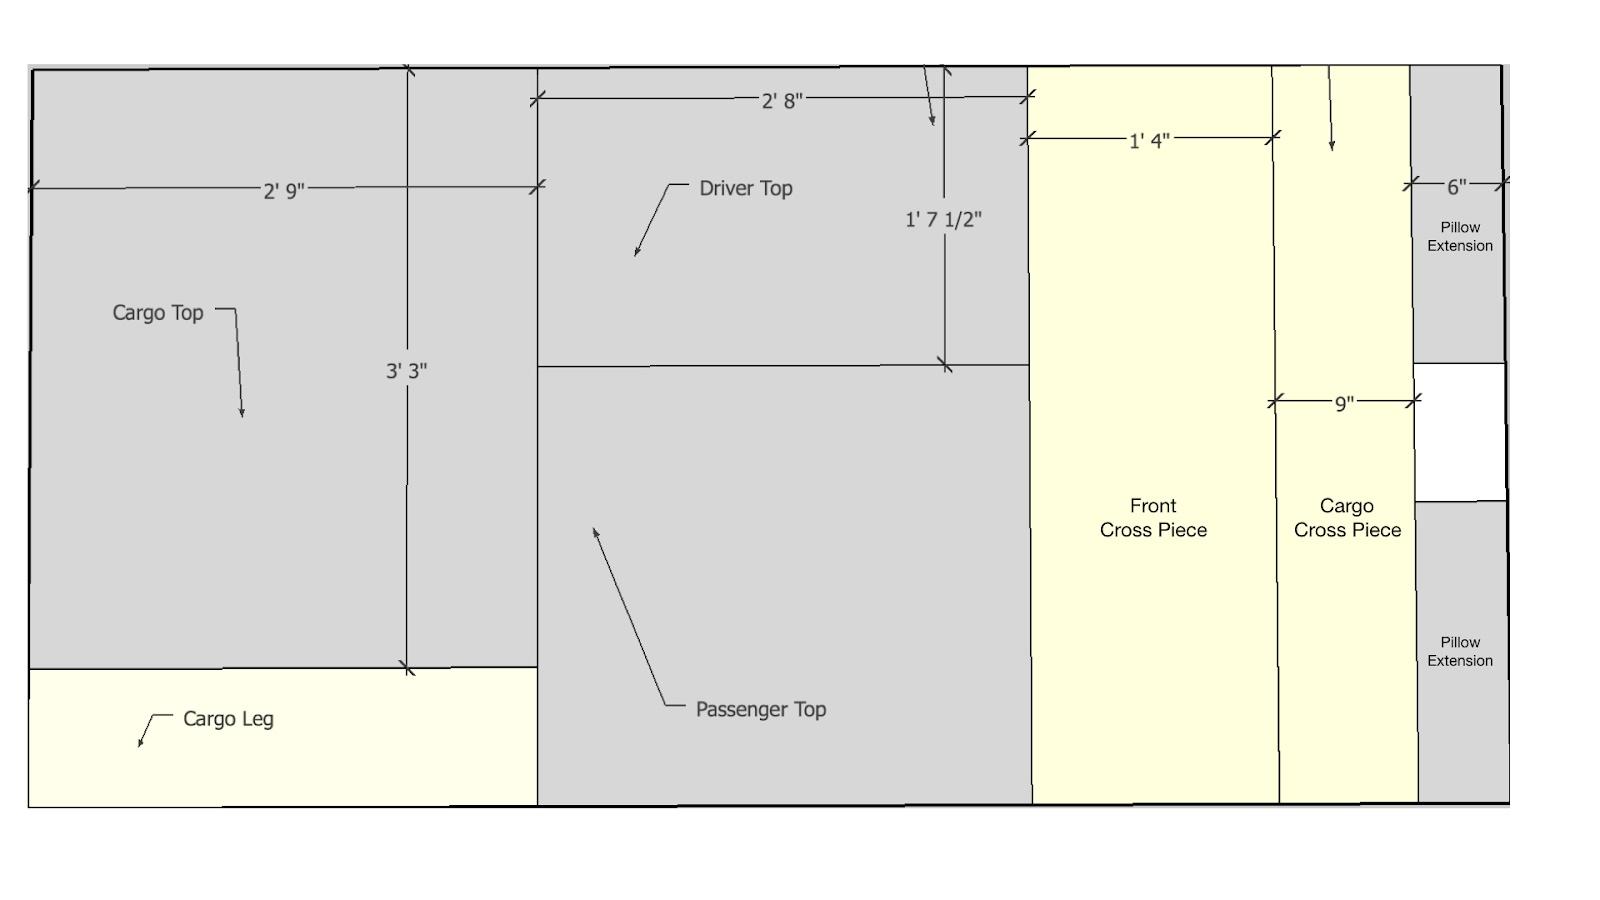 Plywood cut measurements